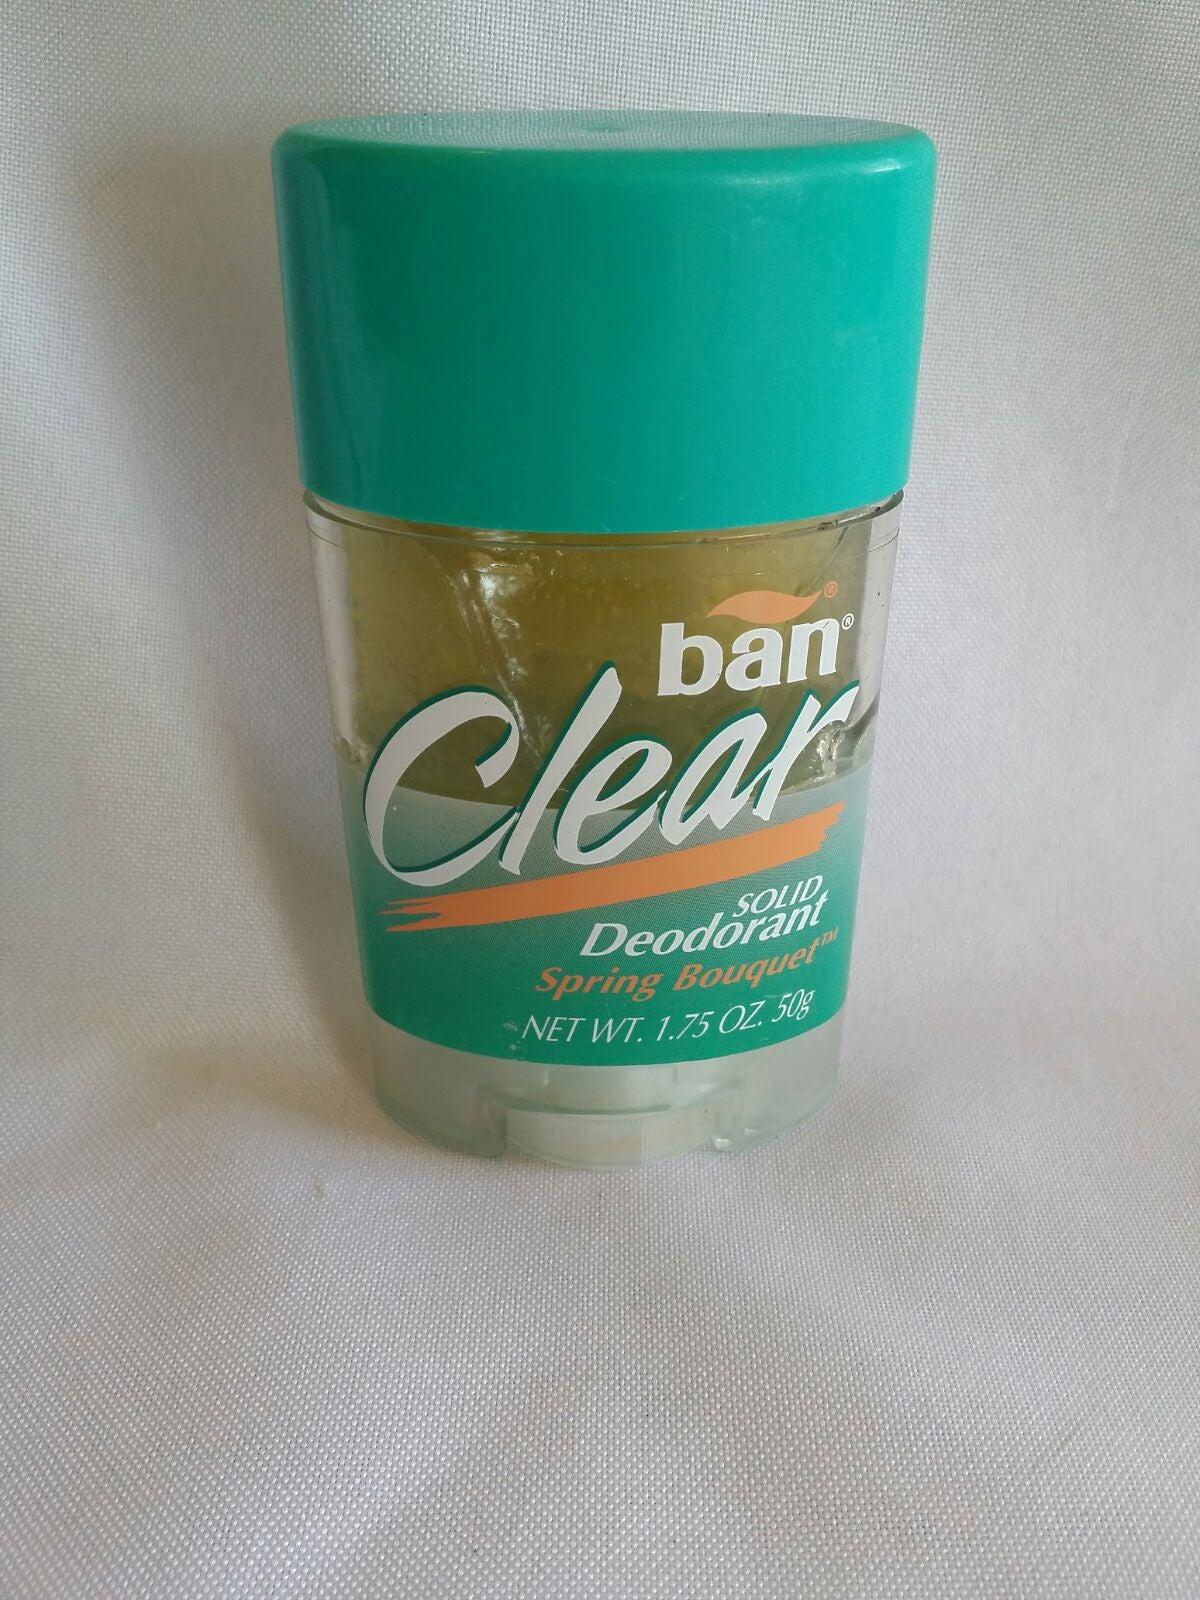 Vintage BAN Clear Solid Deodorant Spring